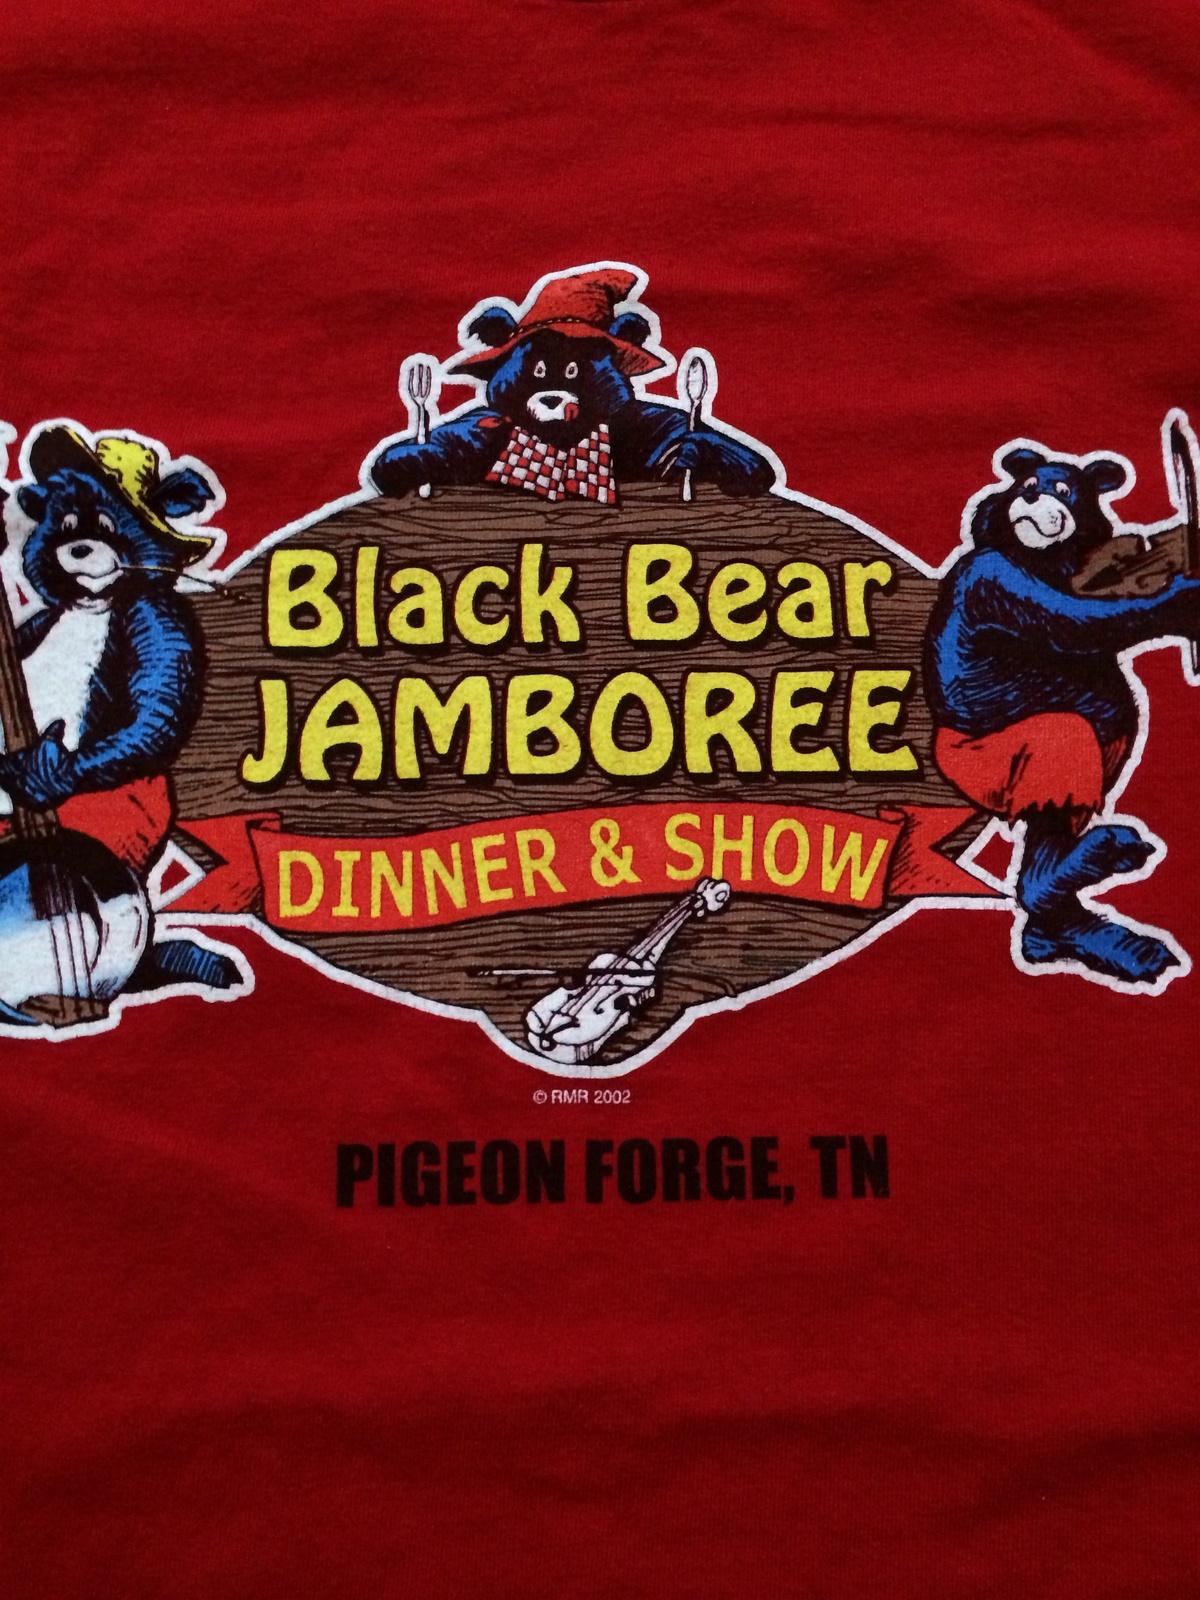 Black Bear Jamboree Dinner & Show Pigeon Forge, TN Cool T-Shirt Sz Large